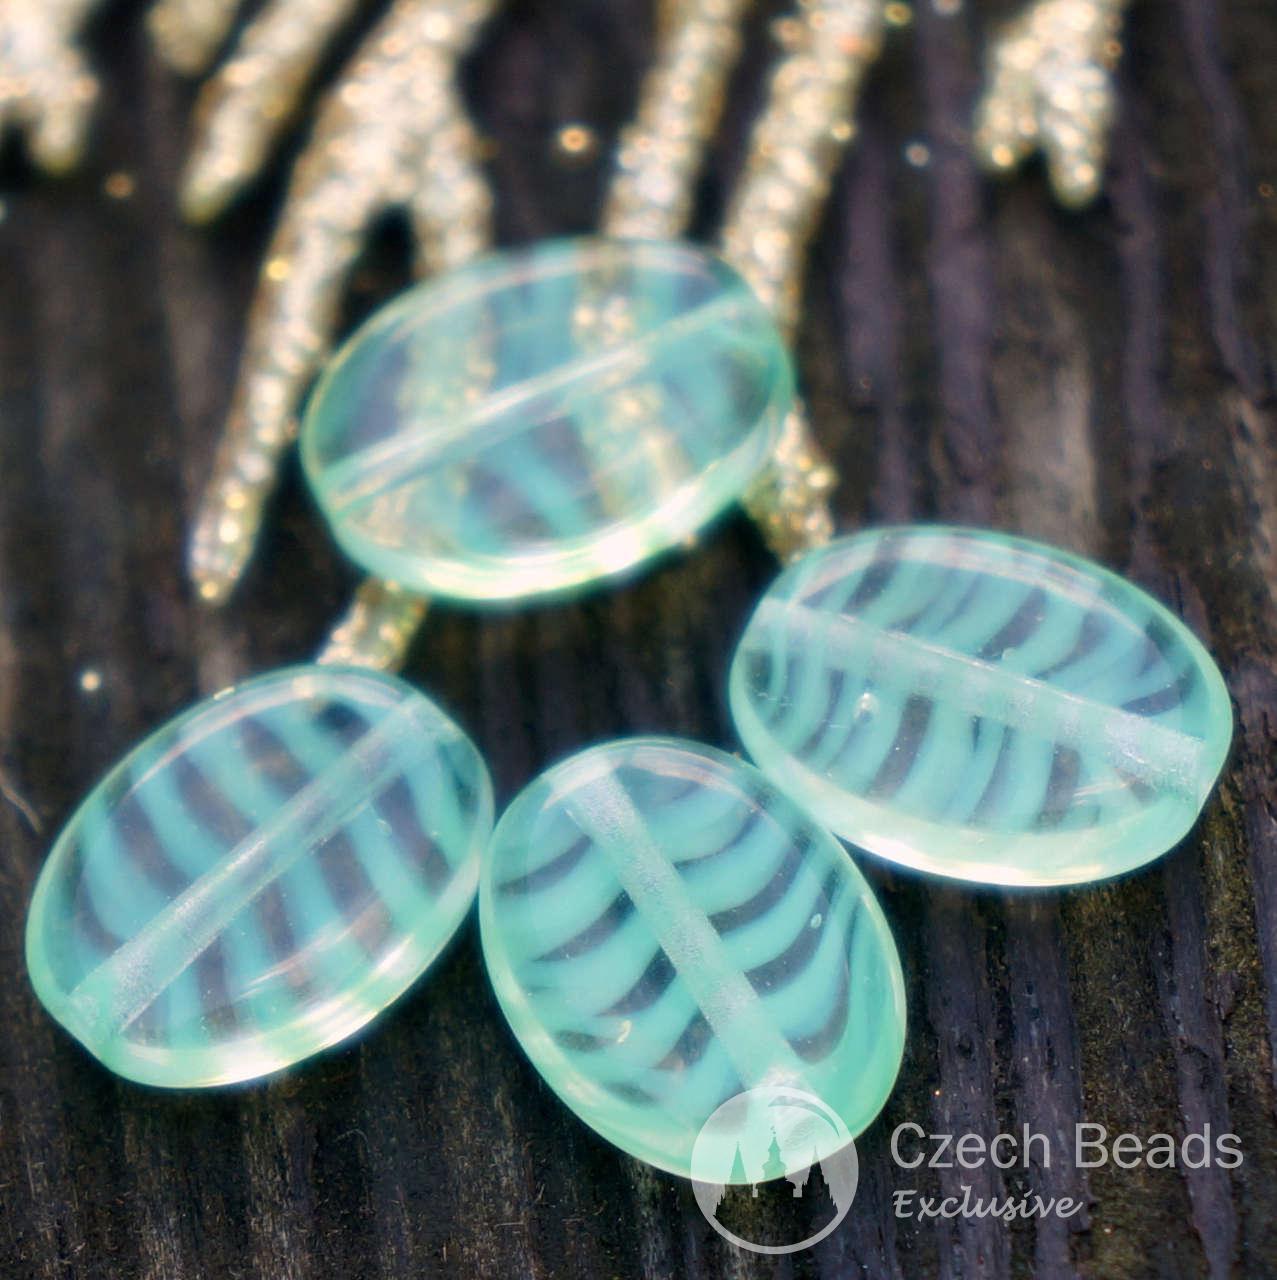 Clear Green Oval Czech Glass Beads Striped Flat Oval Beads Clear Green Beads Green Oval Flat Glass Beads 12mm x 9mm 6pc